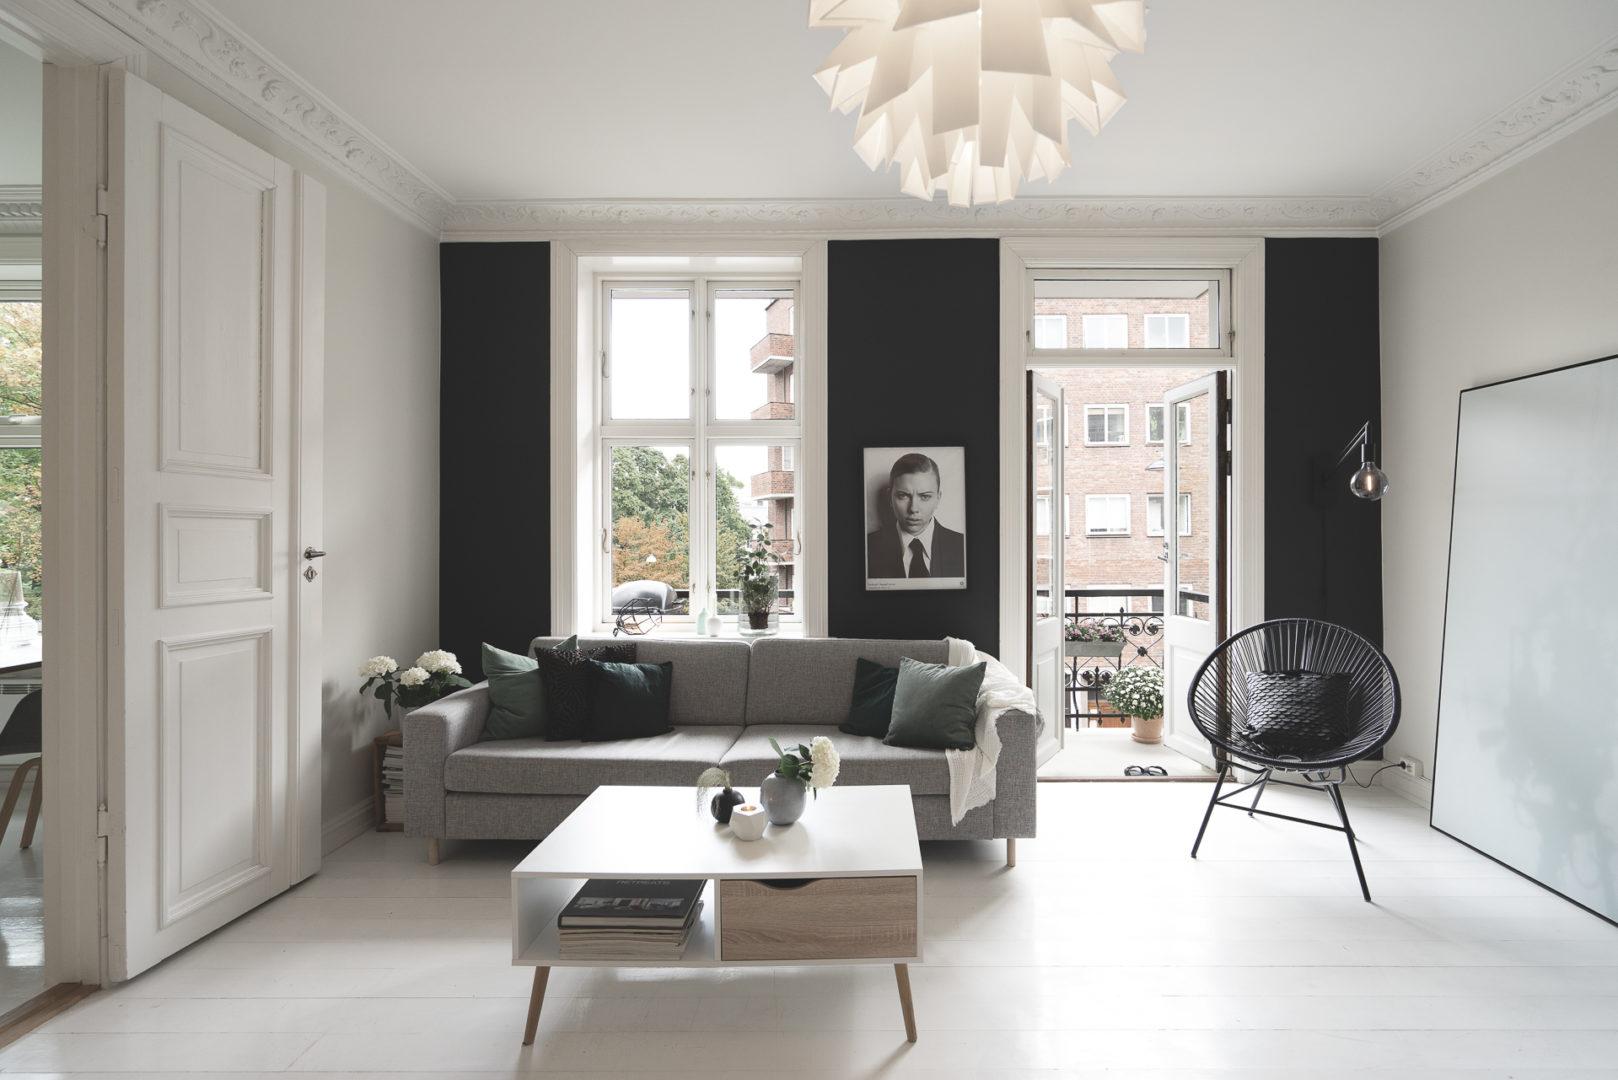 Picture of: Boligreportasje Klassisk Moter Moderne Pa St Hanshaugen